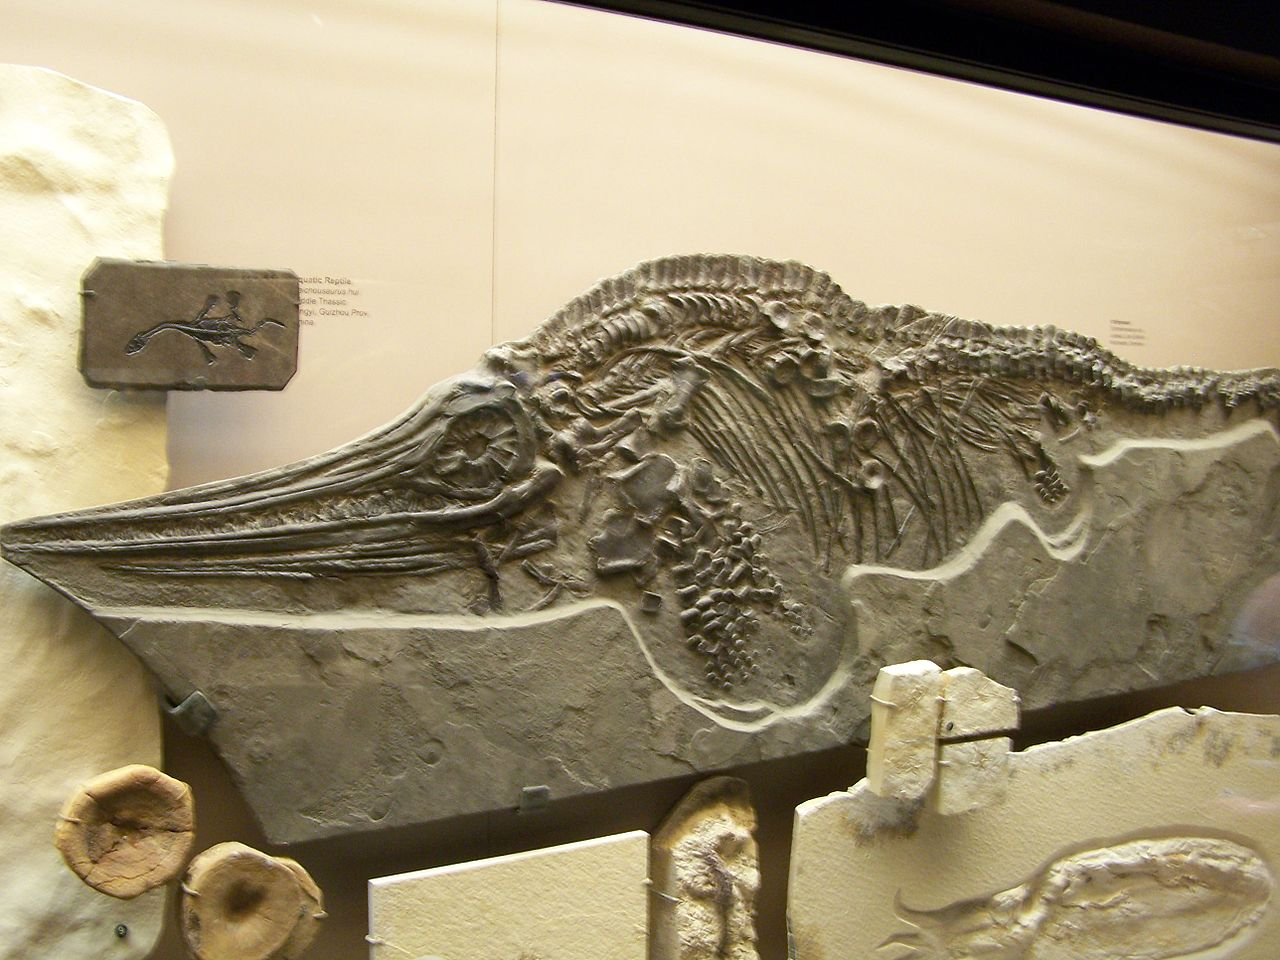 Ichthyosaur fossil. – Image Credit: Zach Tirrell/Wikimedia Commons , CC BY-SA